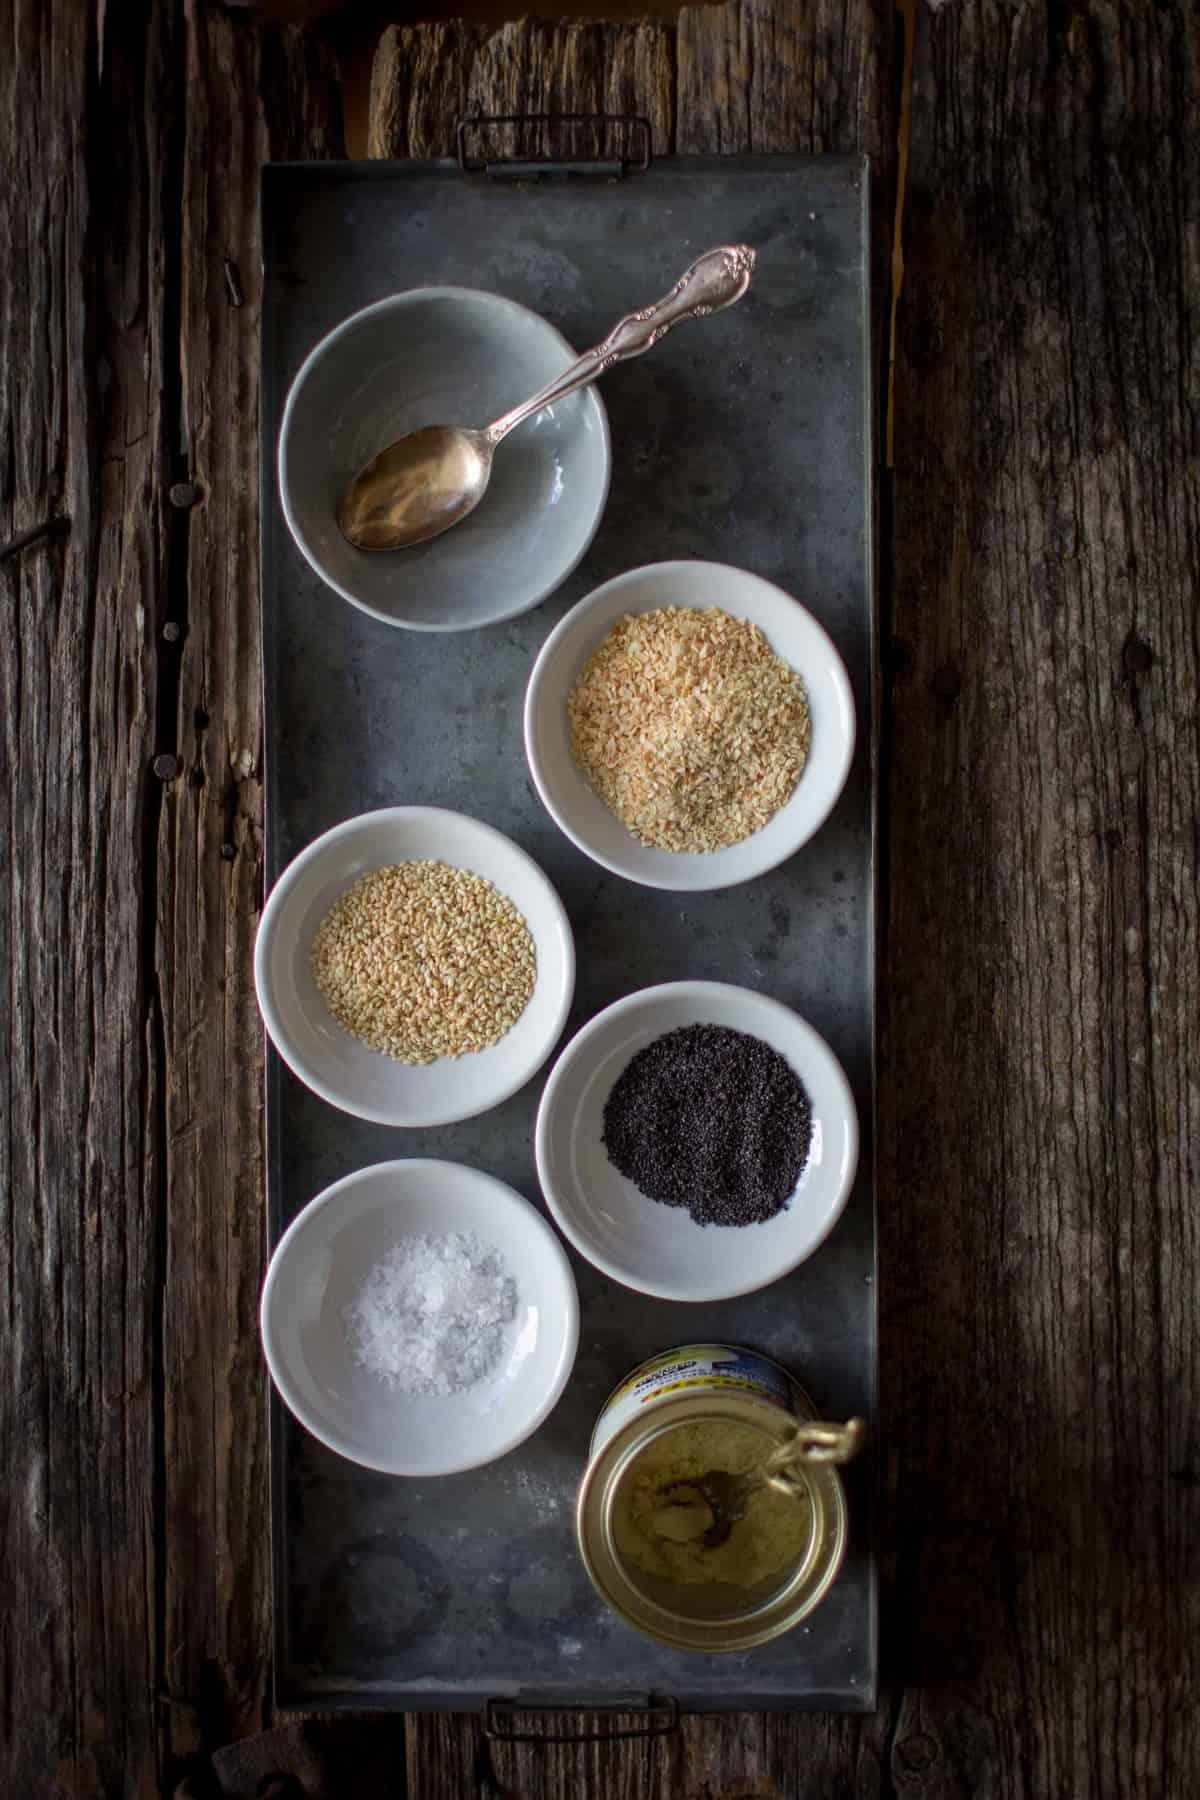 Everything Bagel Spiced Crispy Chickpeas recipe by @beardandbonnet on www.beardandbonnet.com